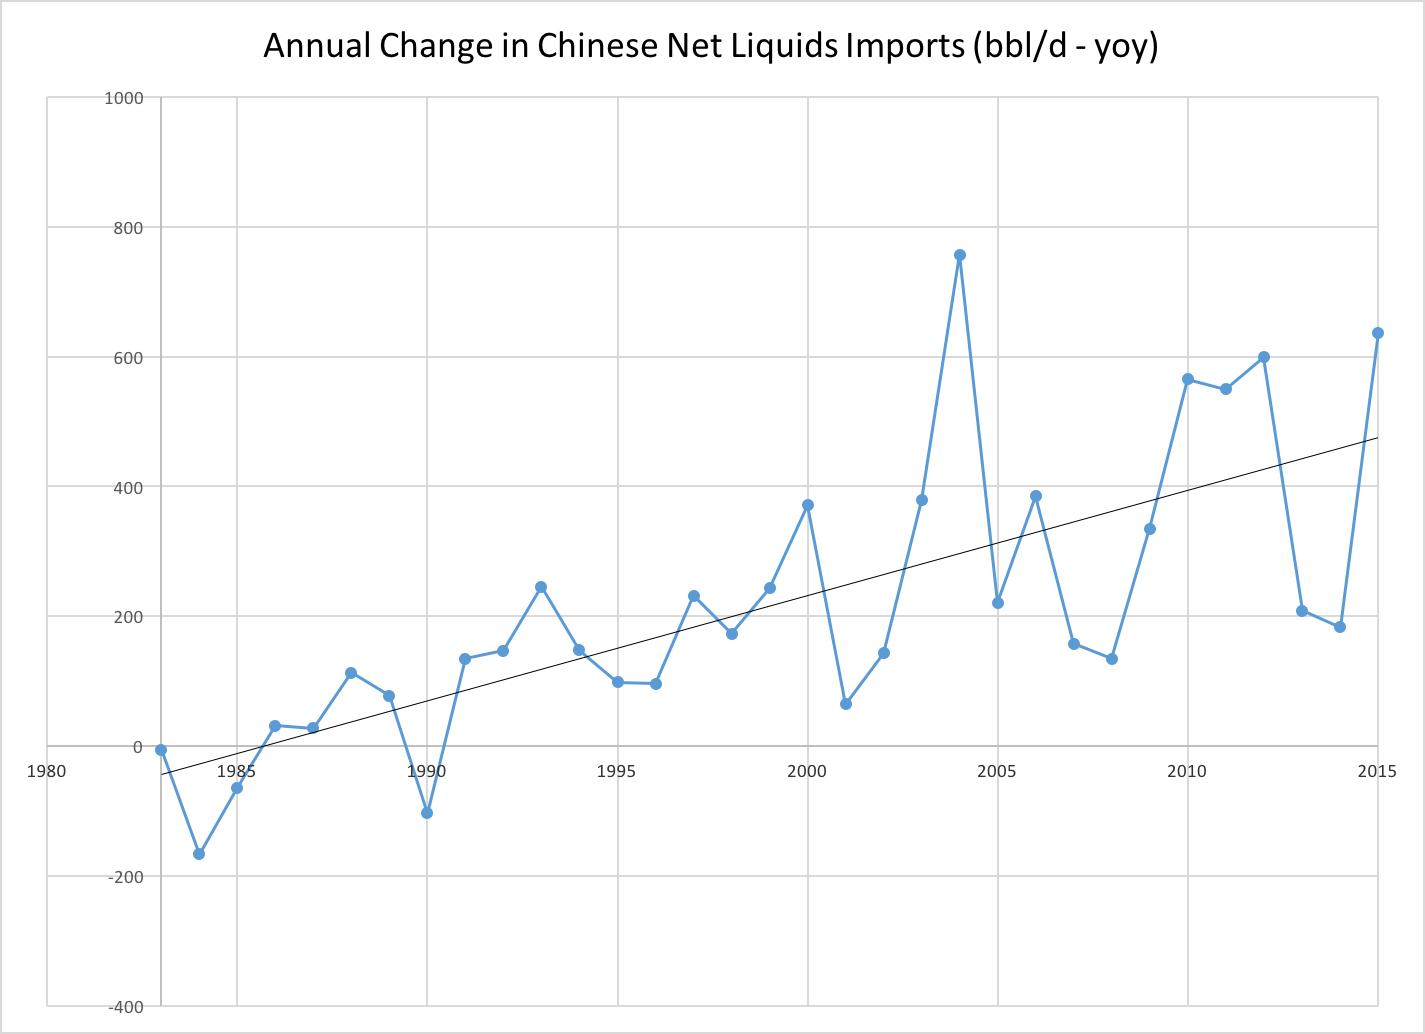 Source: IEA data